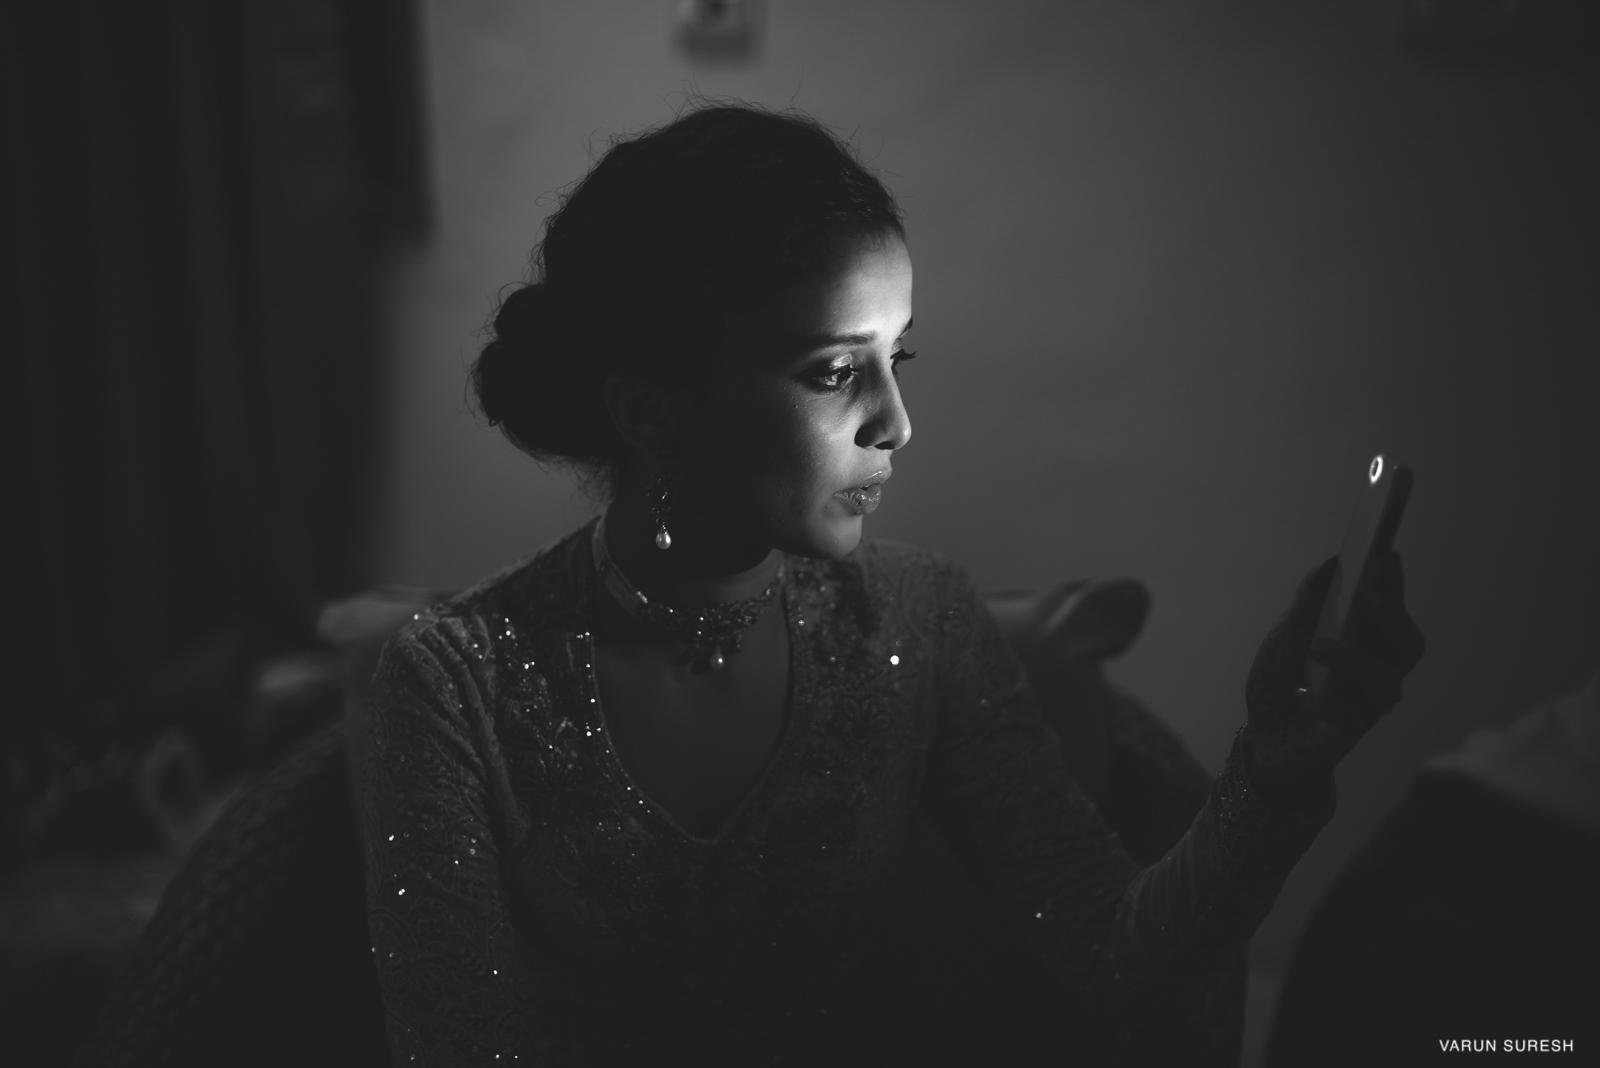 Varun_Suresh_194.jpg